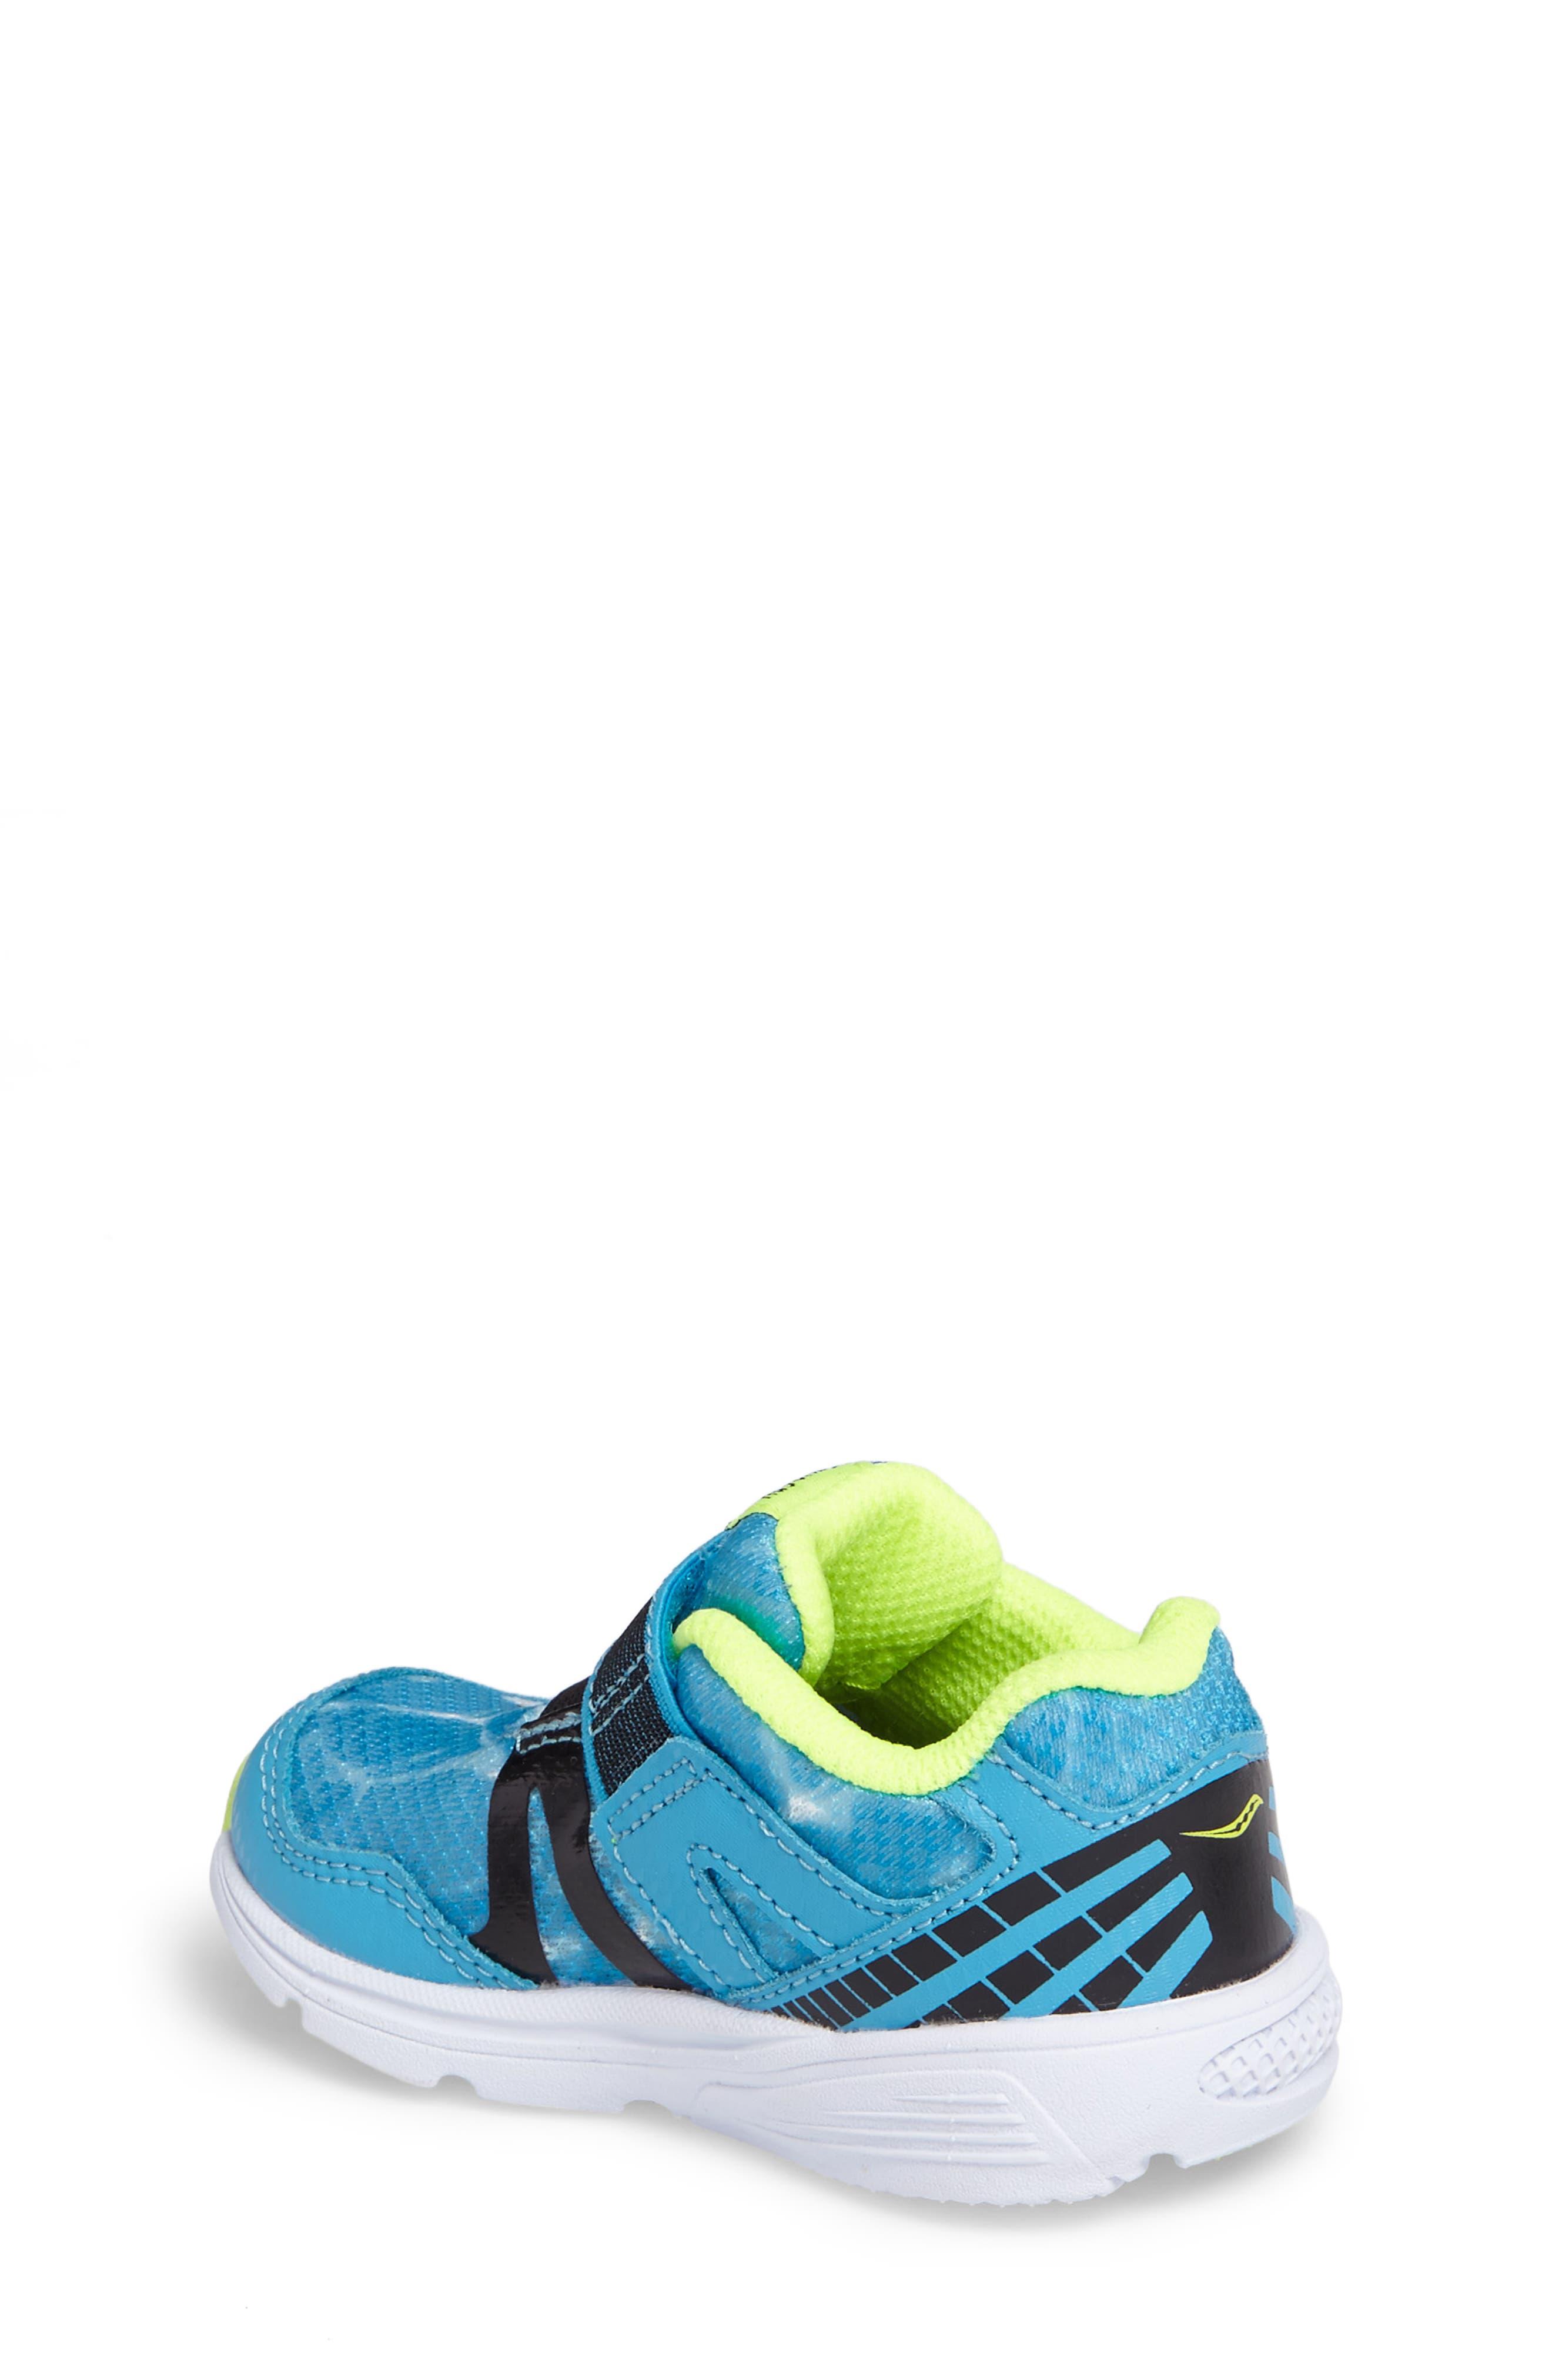 Baby Ride Pro Sneaker,                             Alternate thumbnail 2, color,                             400